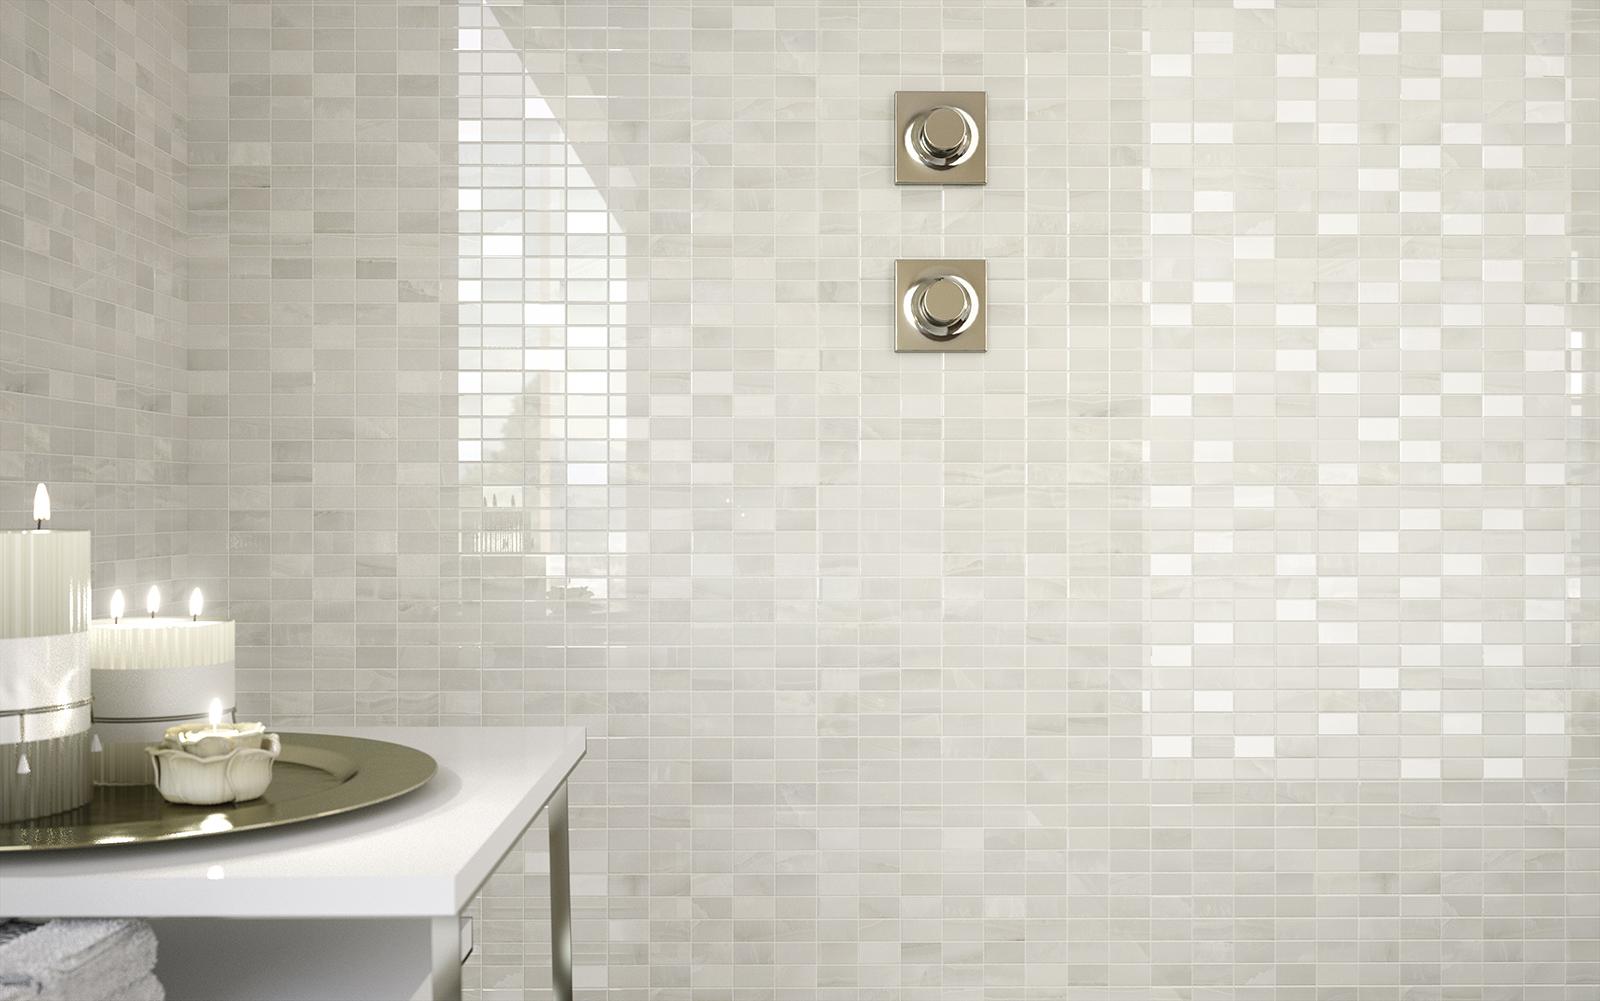 Azulejos ba o imitacion marmol - Bano azulejo blanco ...